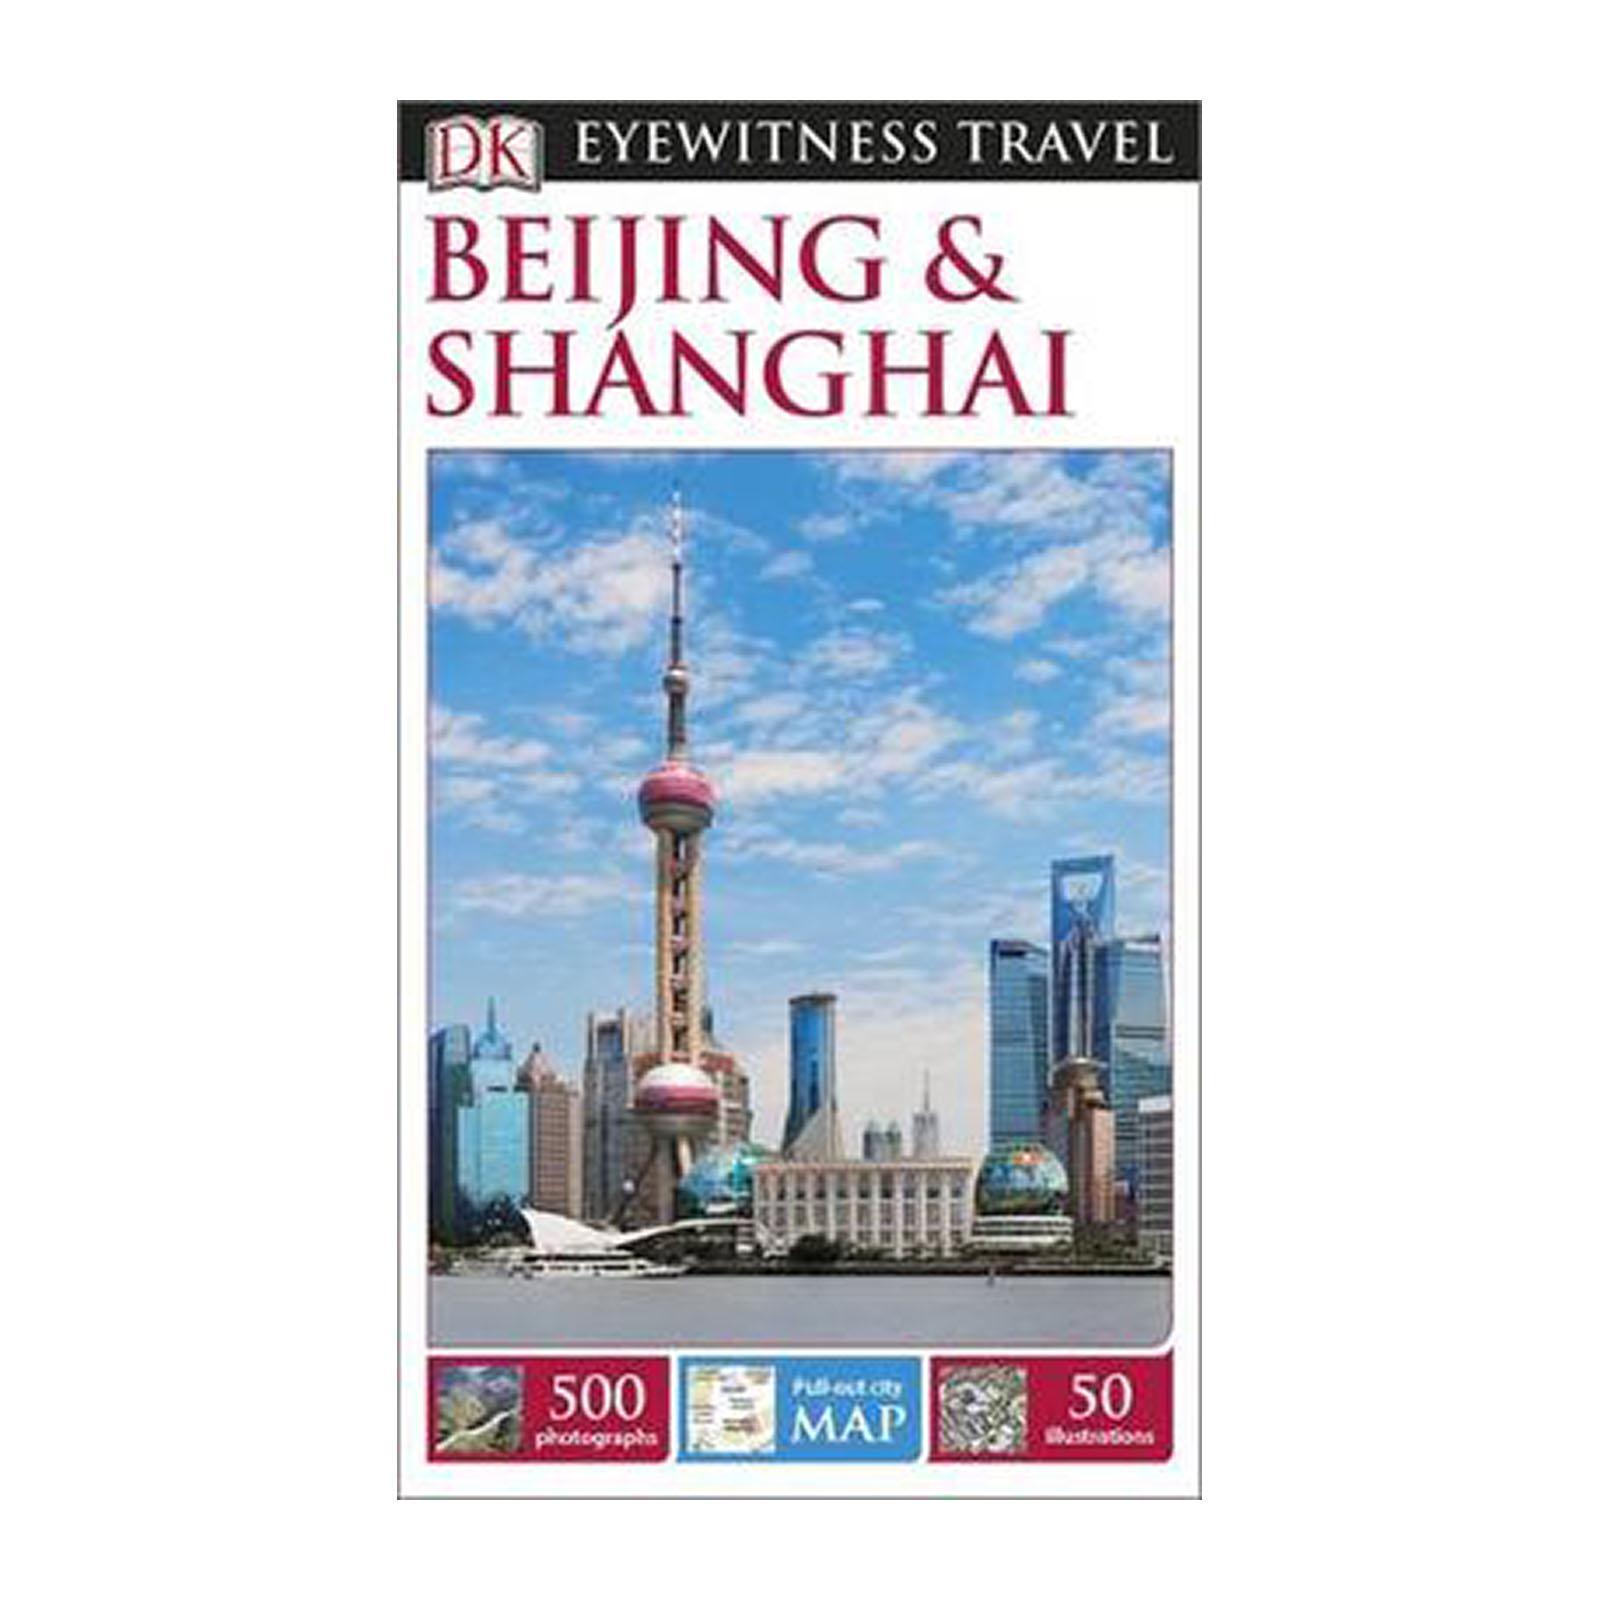 Dk Eyewitness Travel Guide Beijing And Shanghai (Paperback)